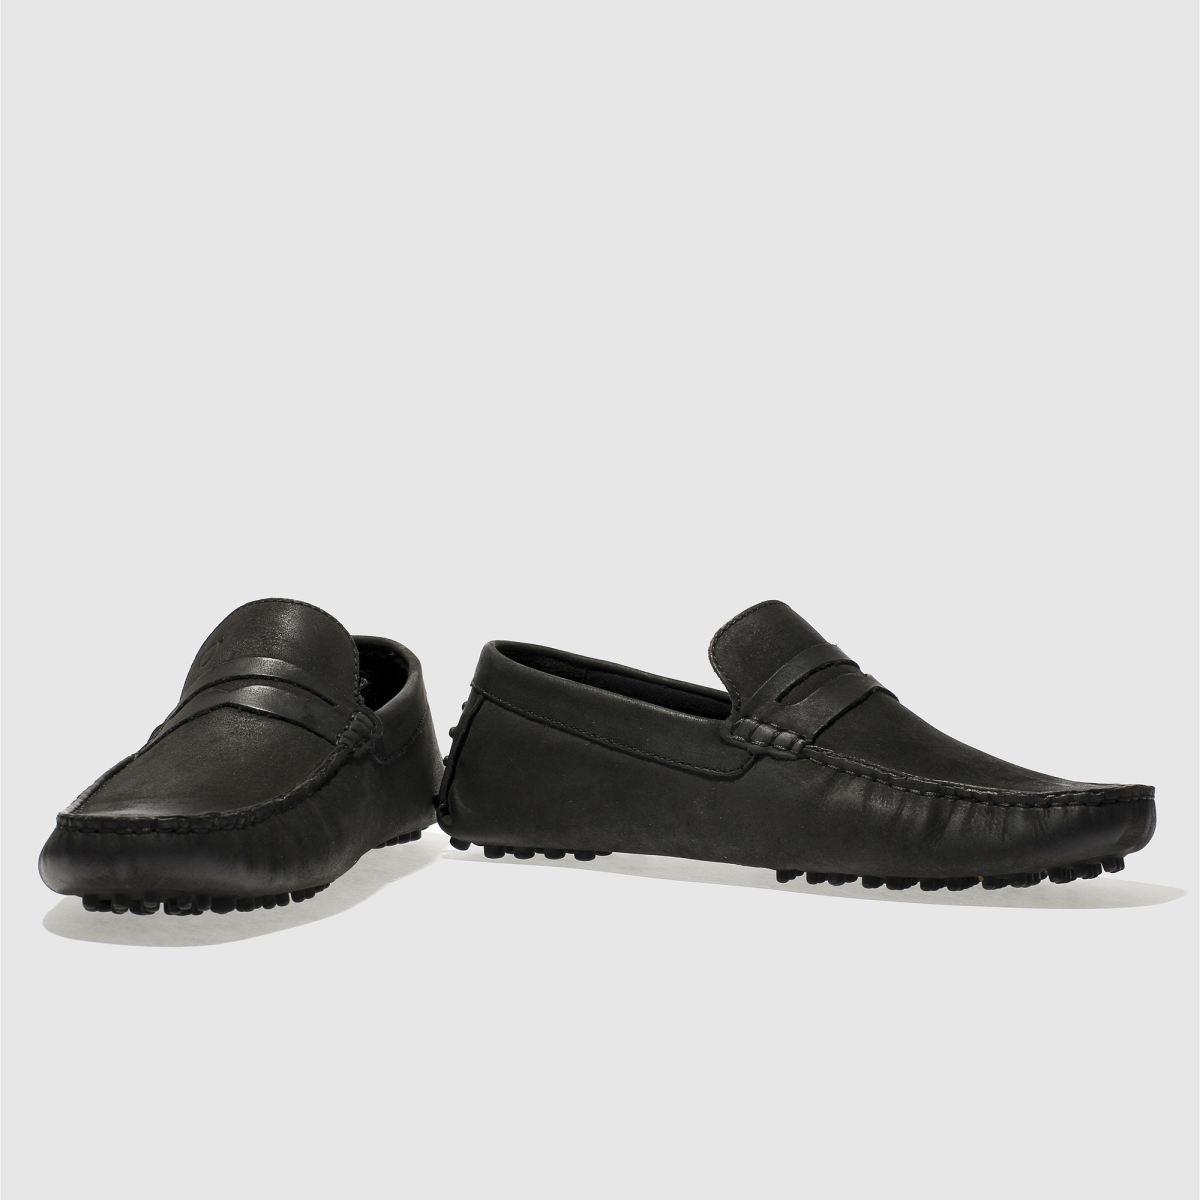 Herren Schwarz base london Morgan Schuhe | schuh Gute Qualität beliebte Schuhe